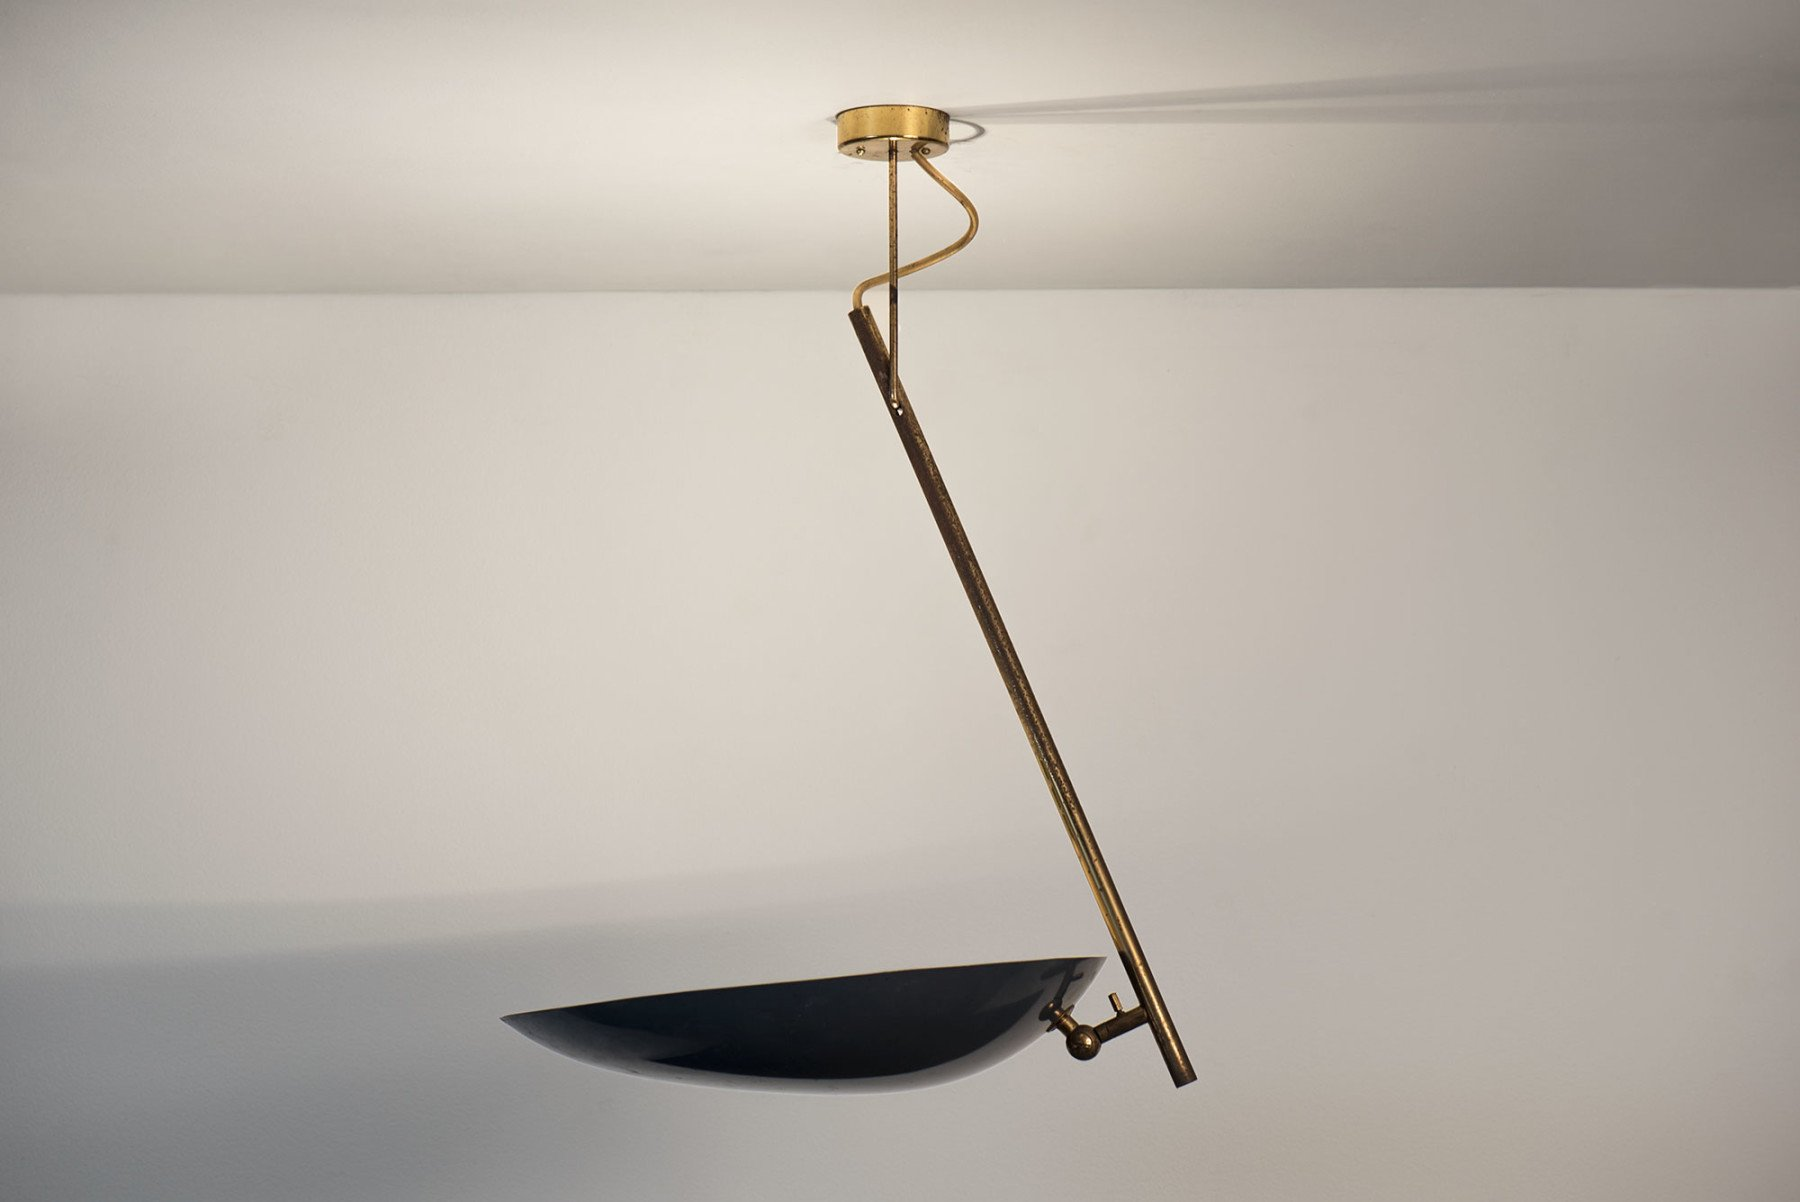 Vittoriano Viganò |                              Ceiling light, model 2059